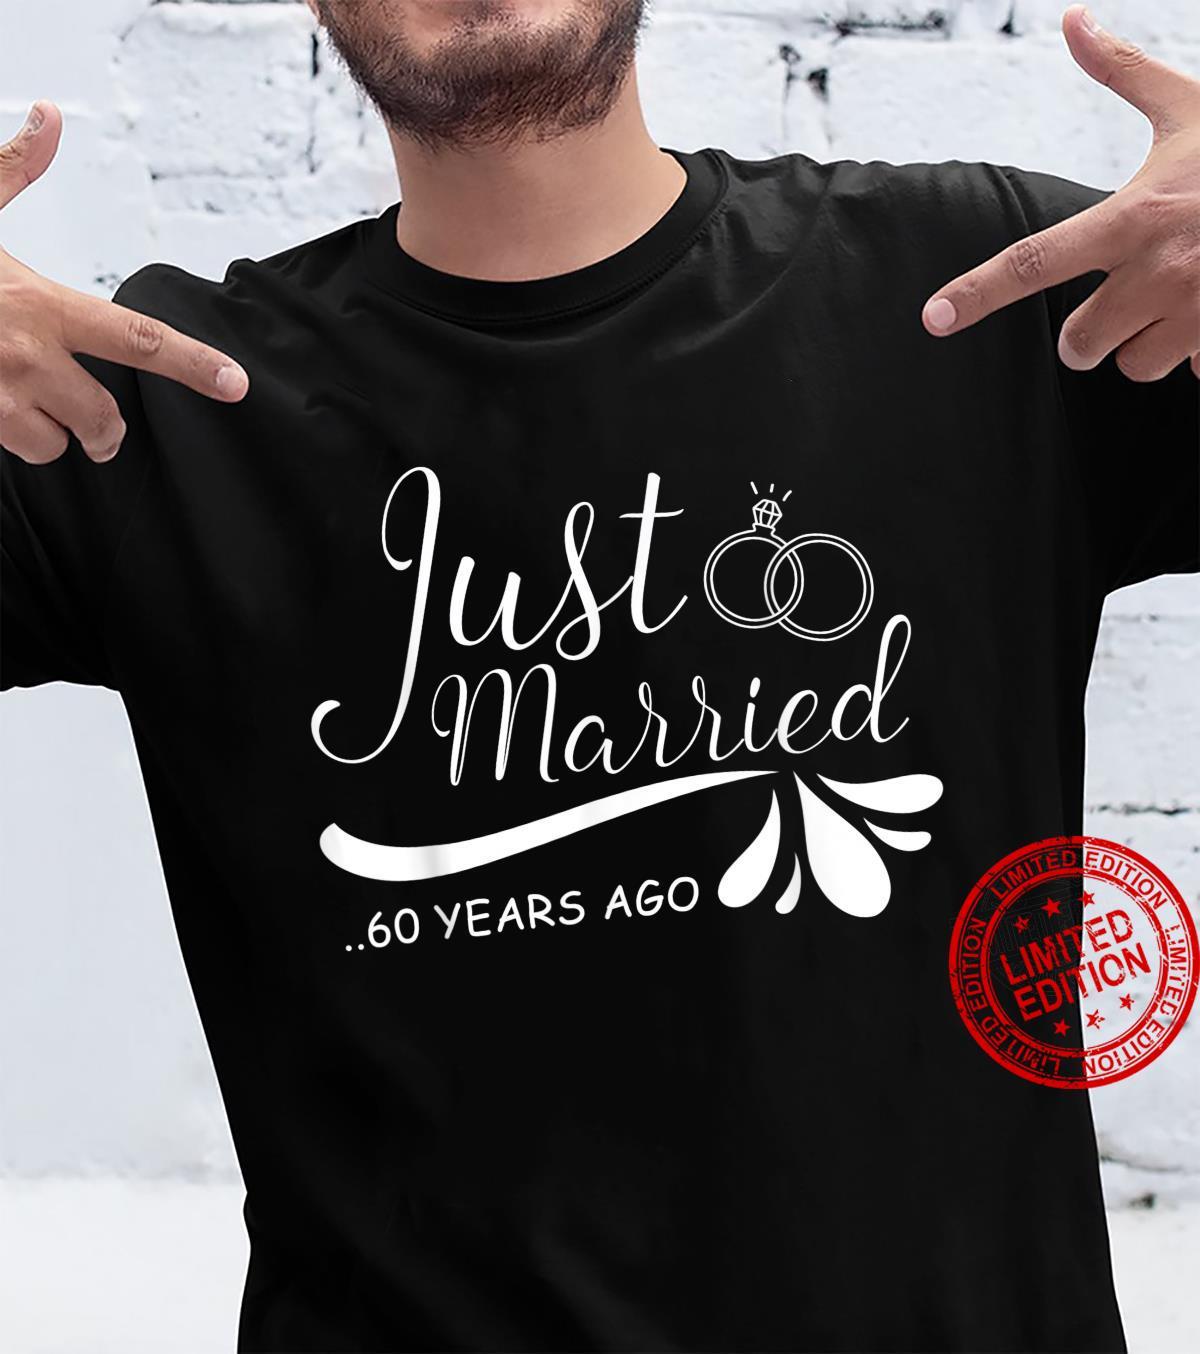 Just Married 60 Years Ago 60Th Wedding Anniversary Shirt